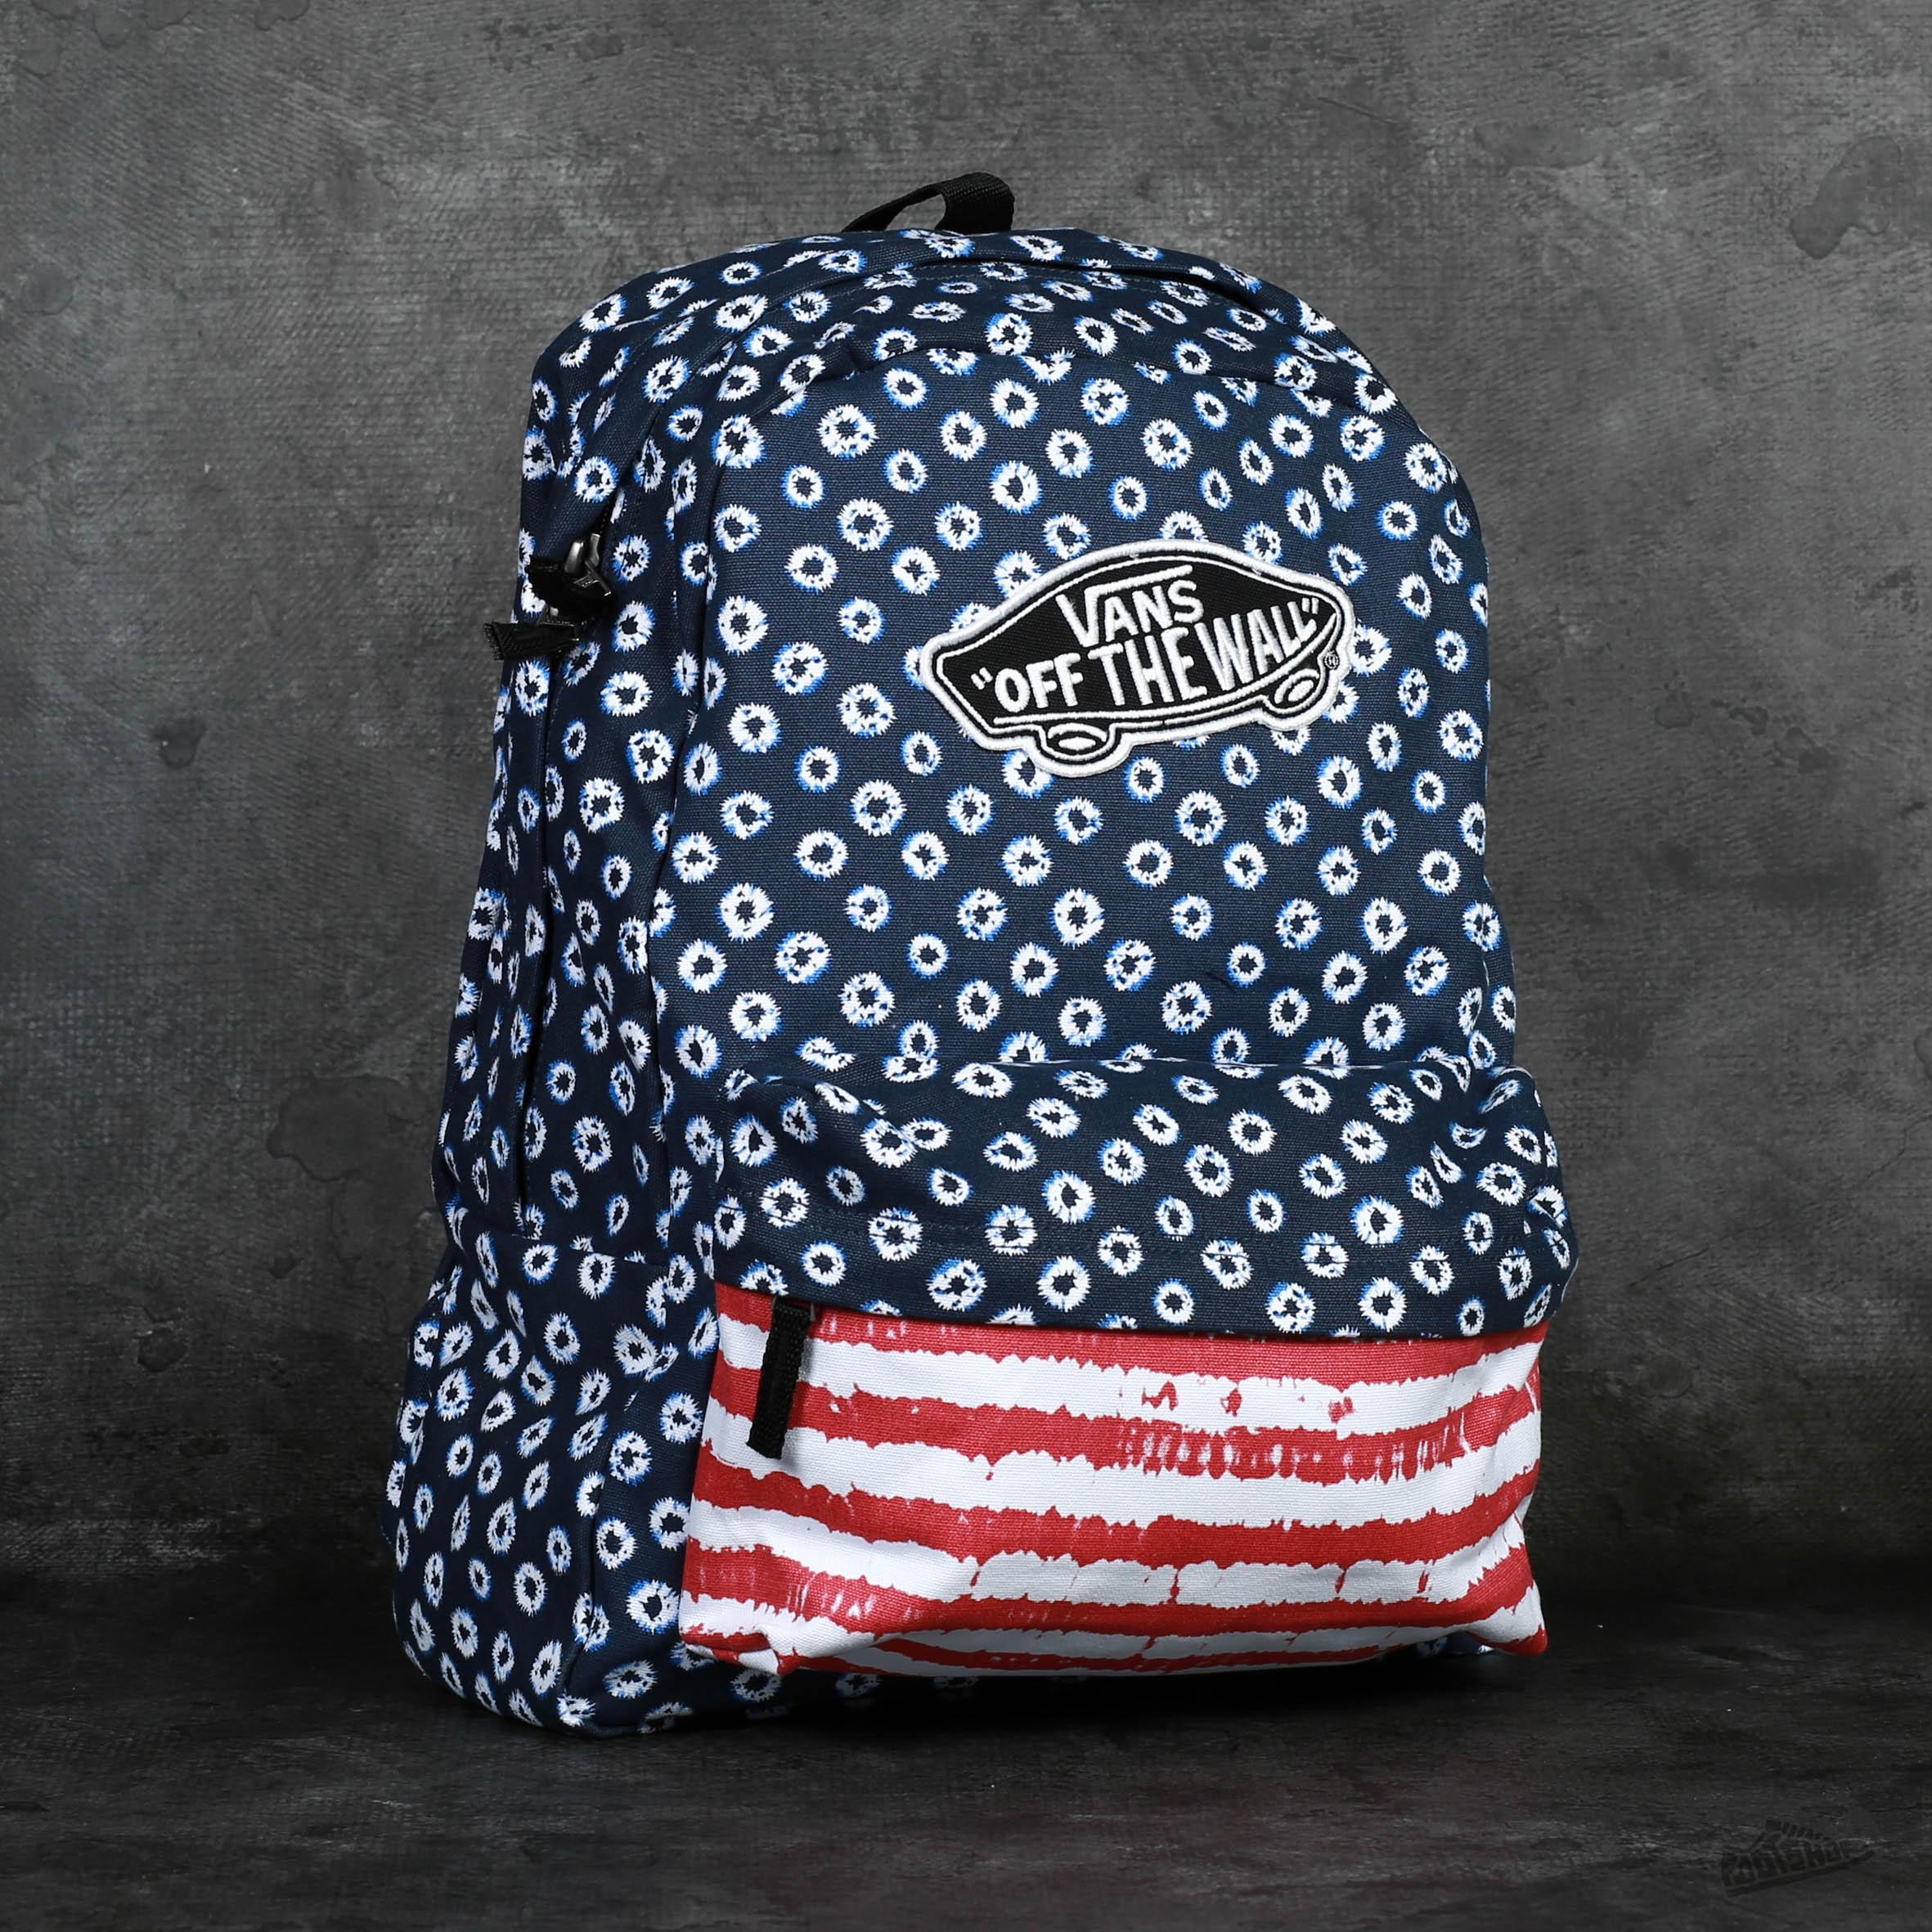 47affd580dd46f Vans Realm Backpack Dyed Dots   Stripes